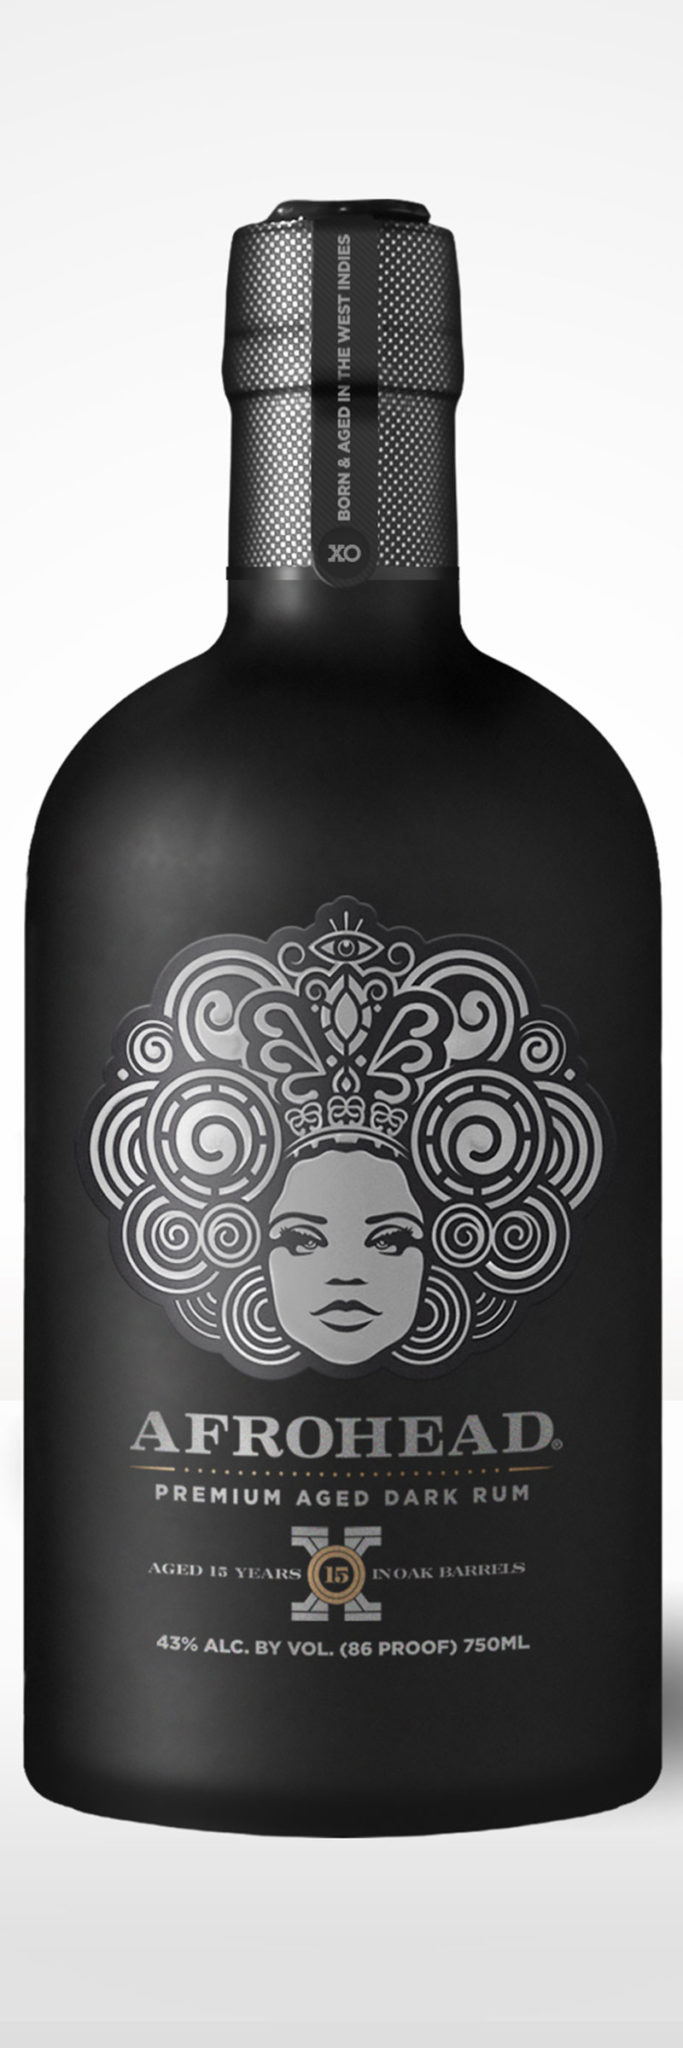 AfroHead XO 15 Image